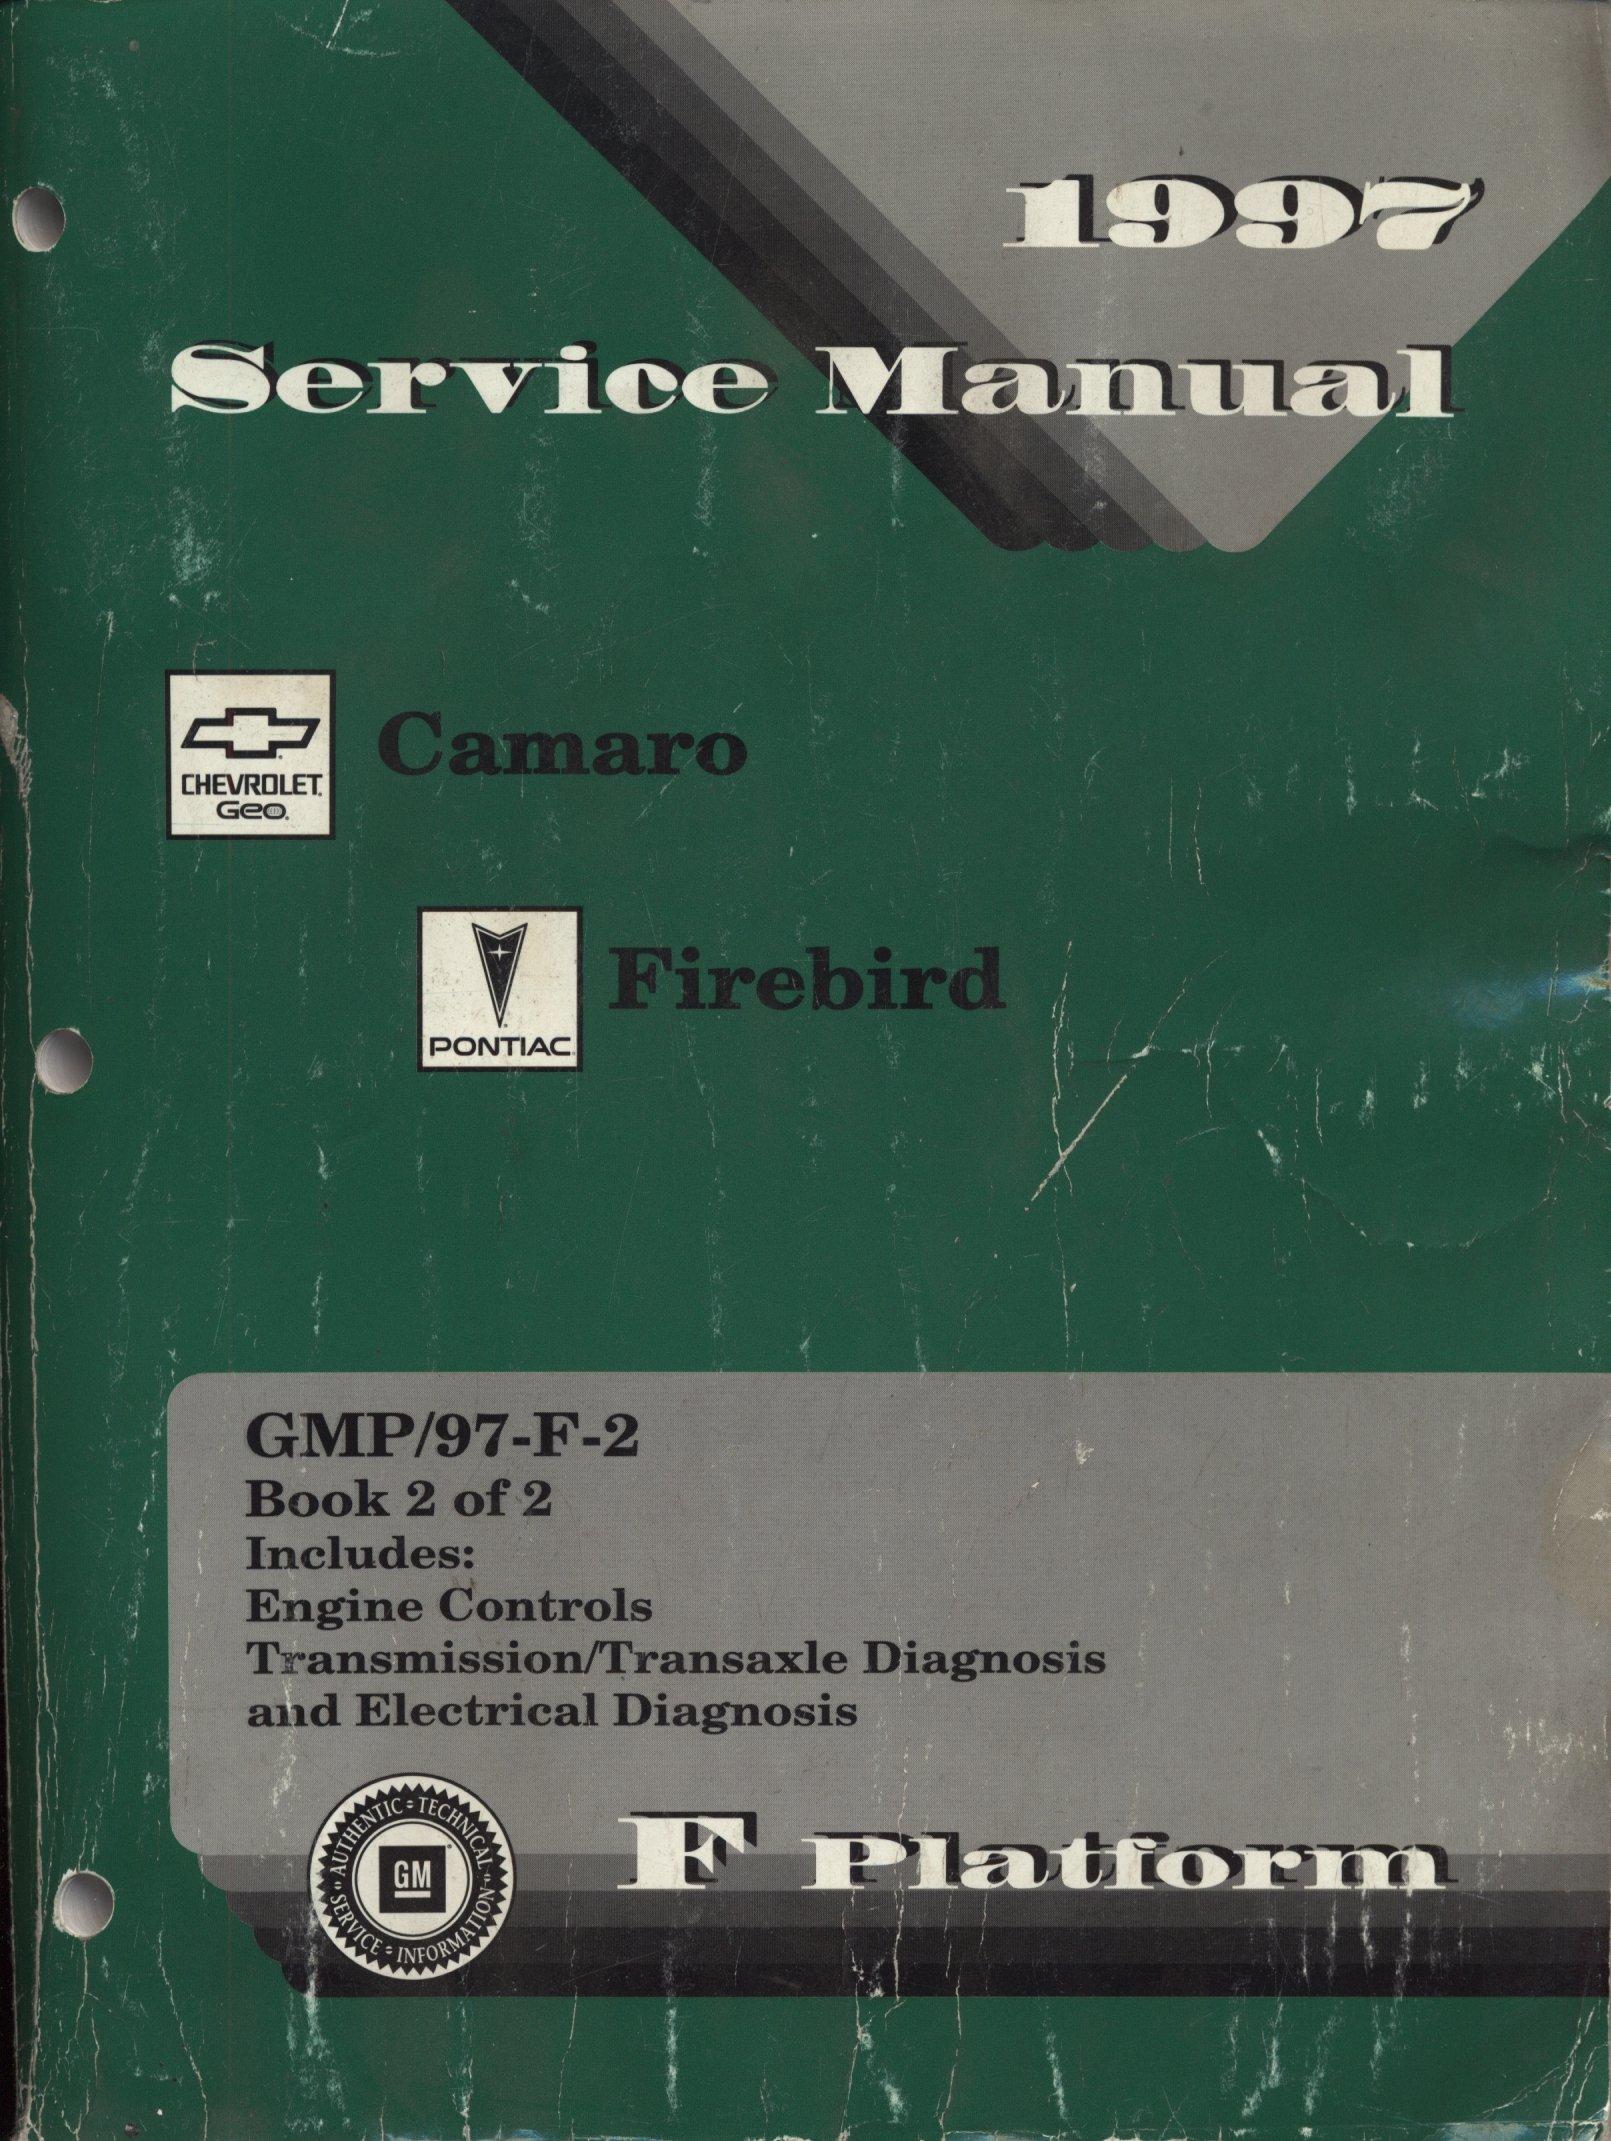 1997 Chevrolet Camaro Pontiac Firebird Factory Service Manual F Platform:  General Motors Corp: Amazon.com: Books